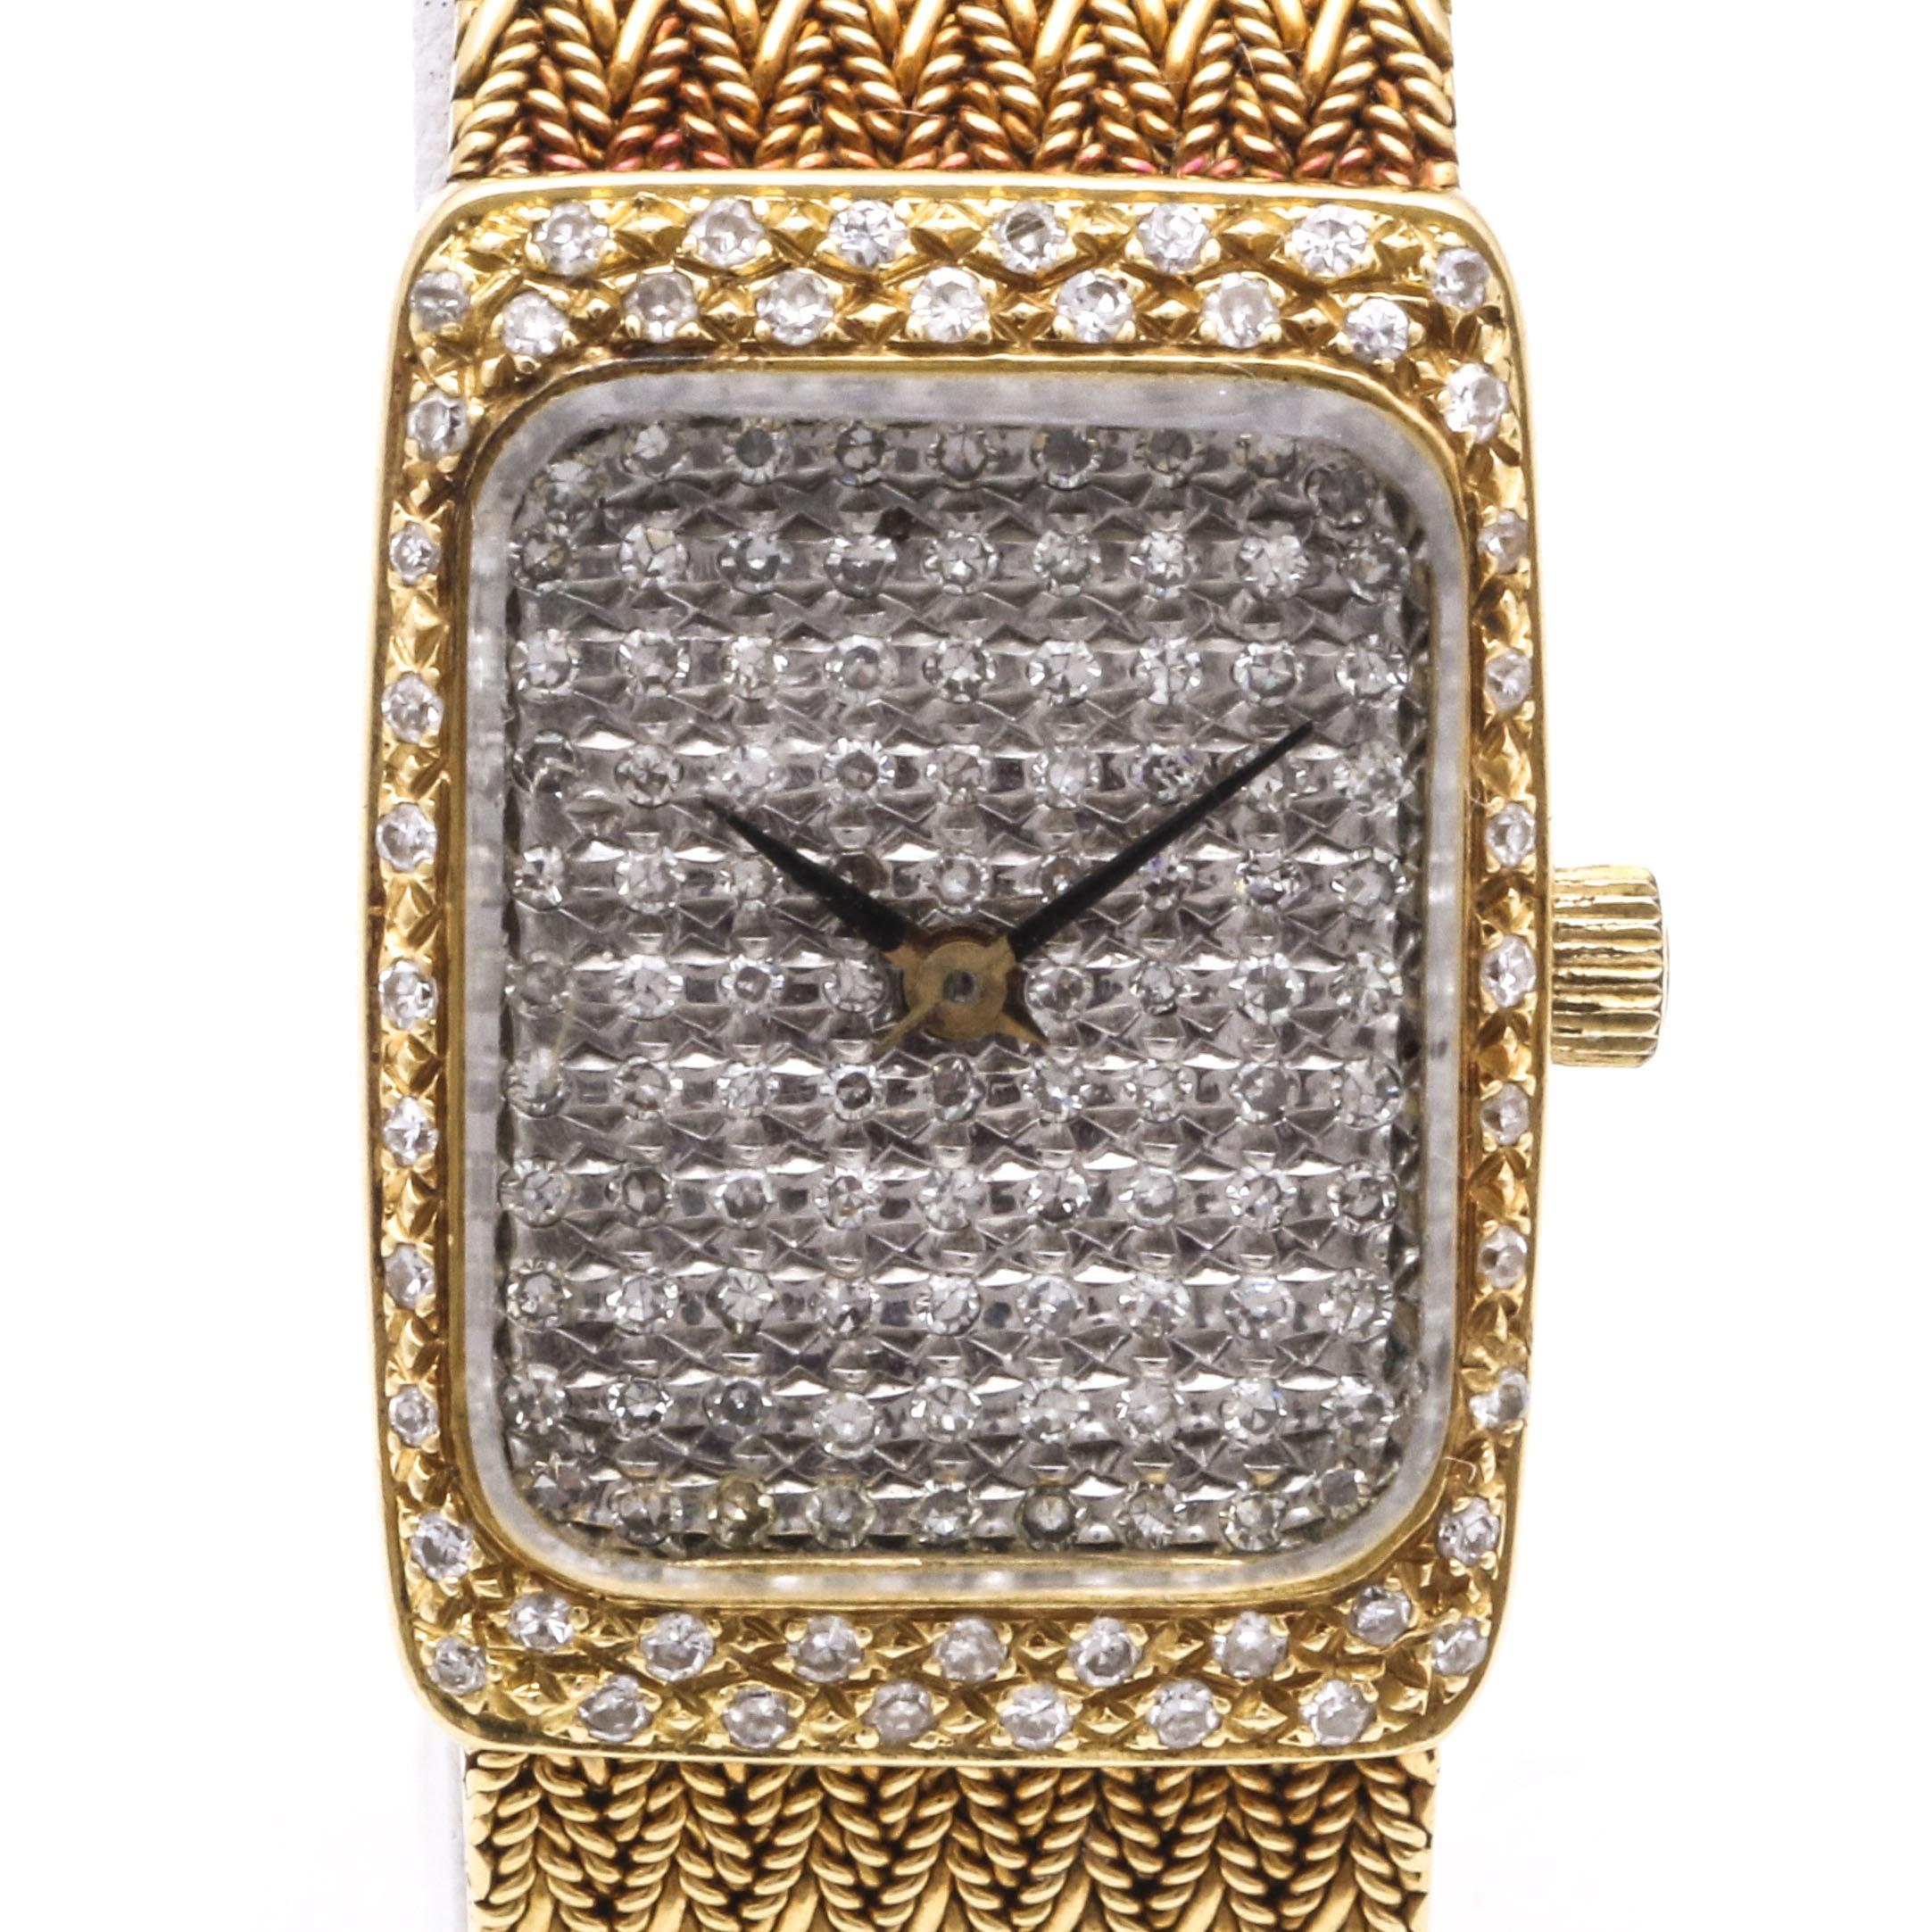 18K Yellow Gold and Diamond Universal Genève Watch